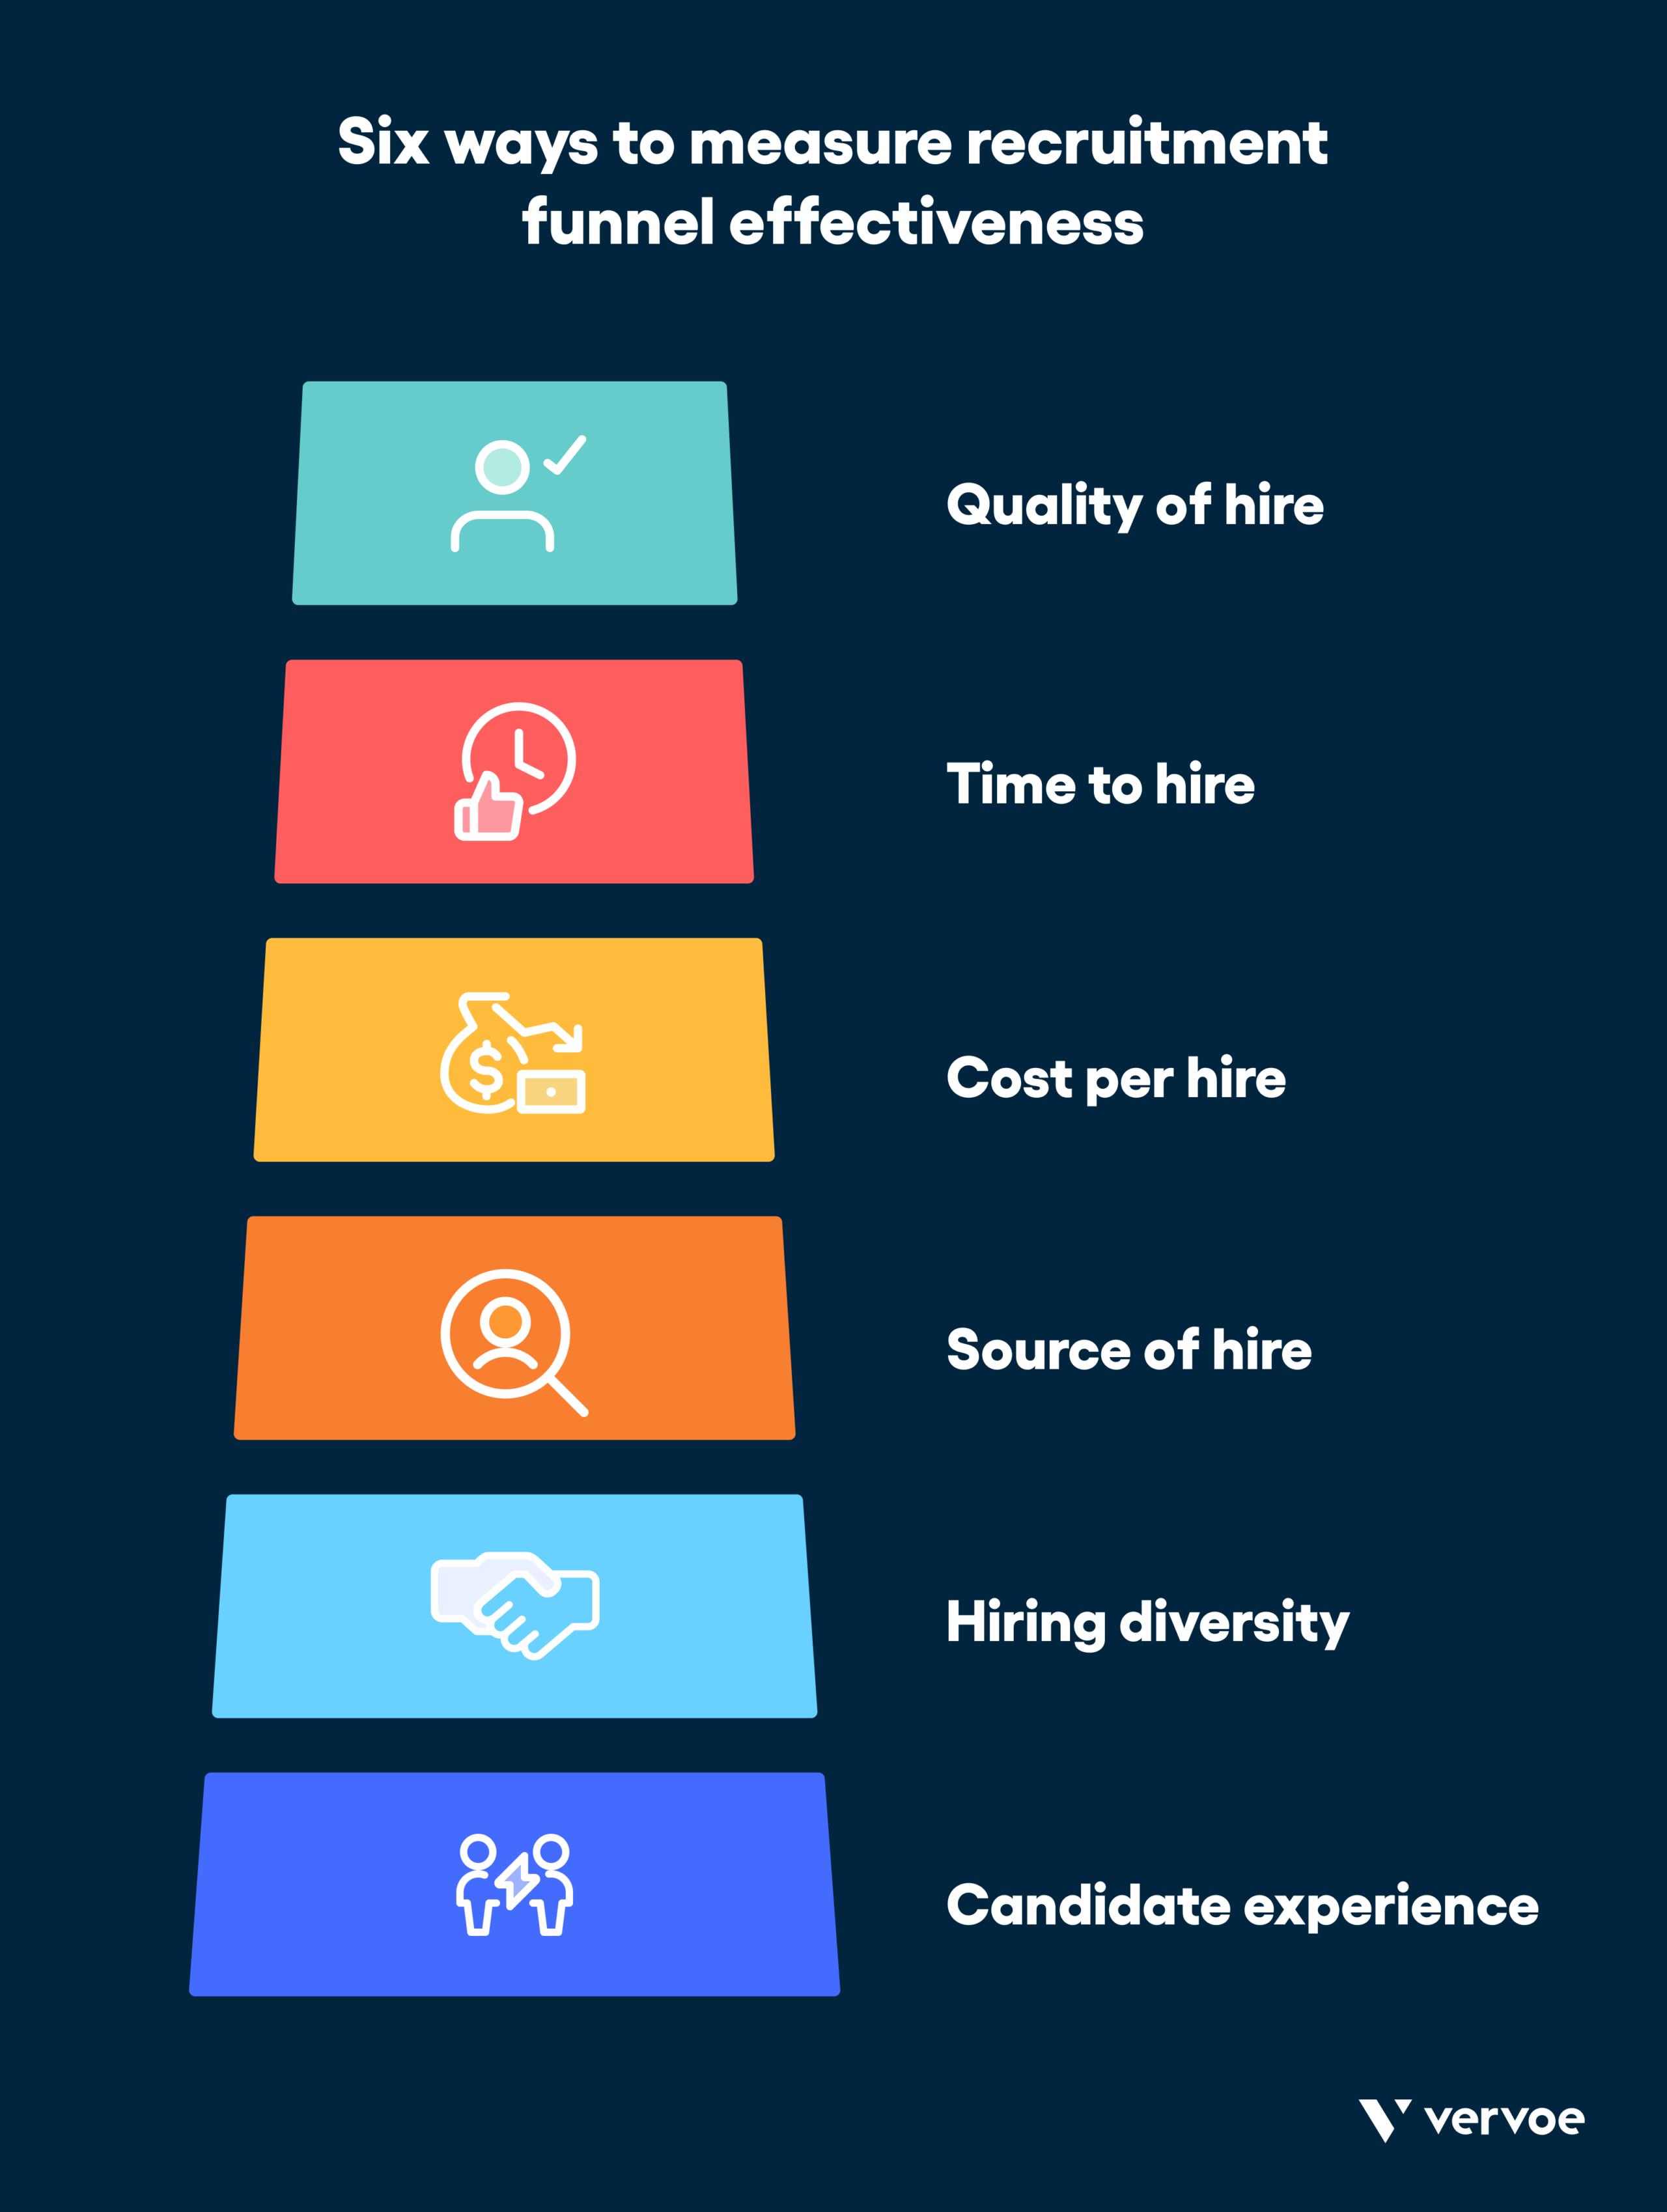 Six ways to measure recruitment funnel effectiveness